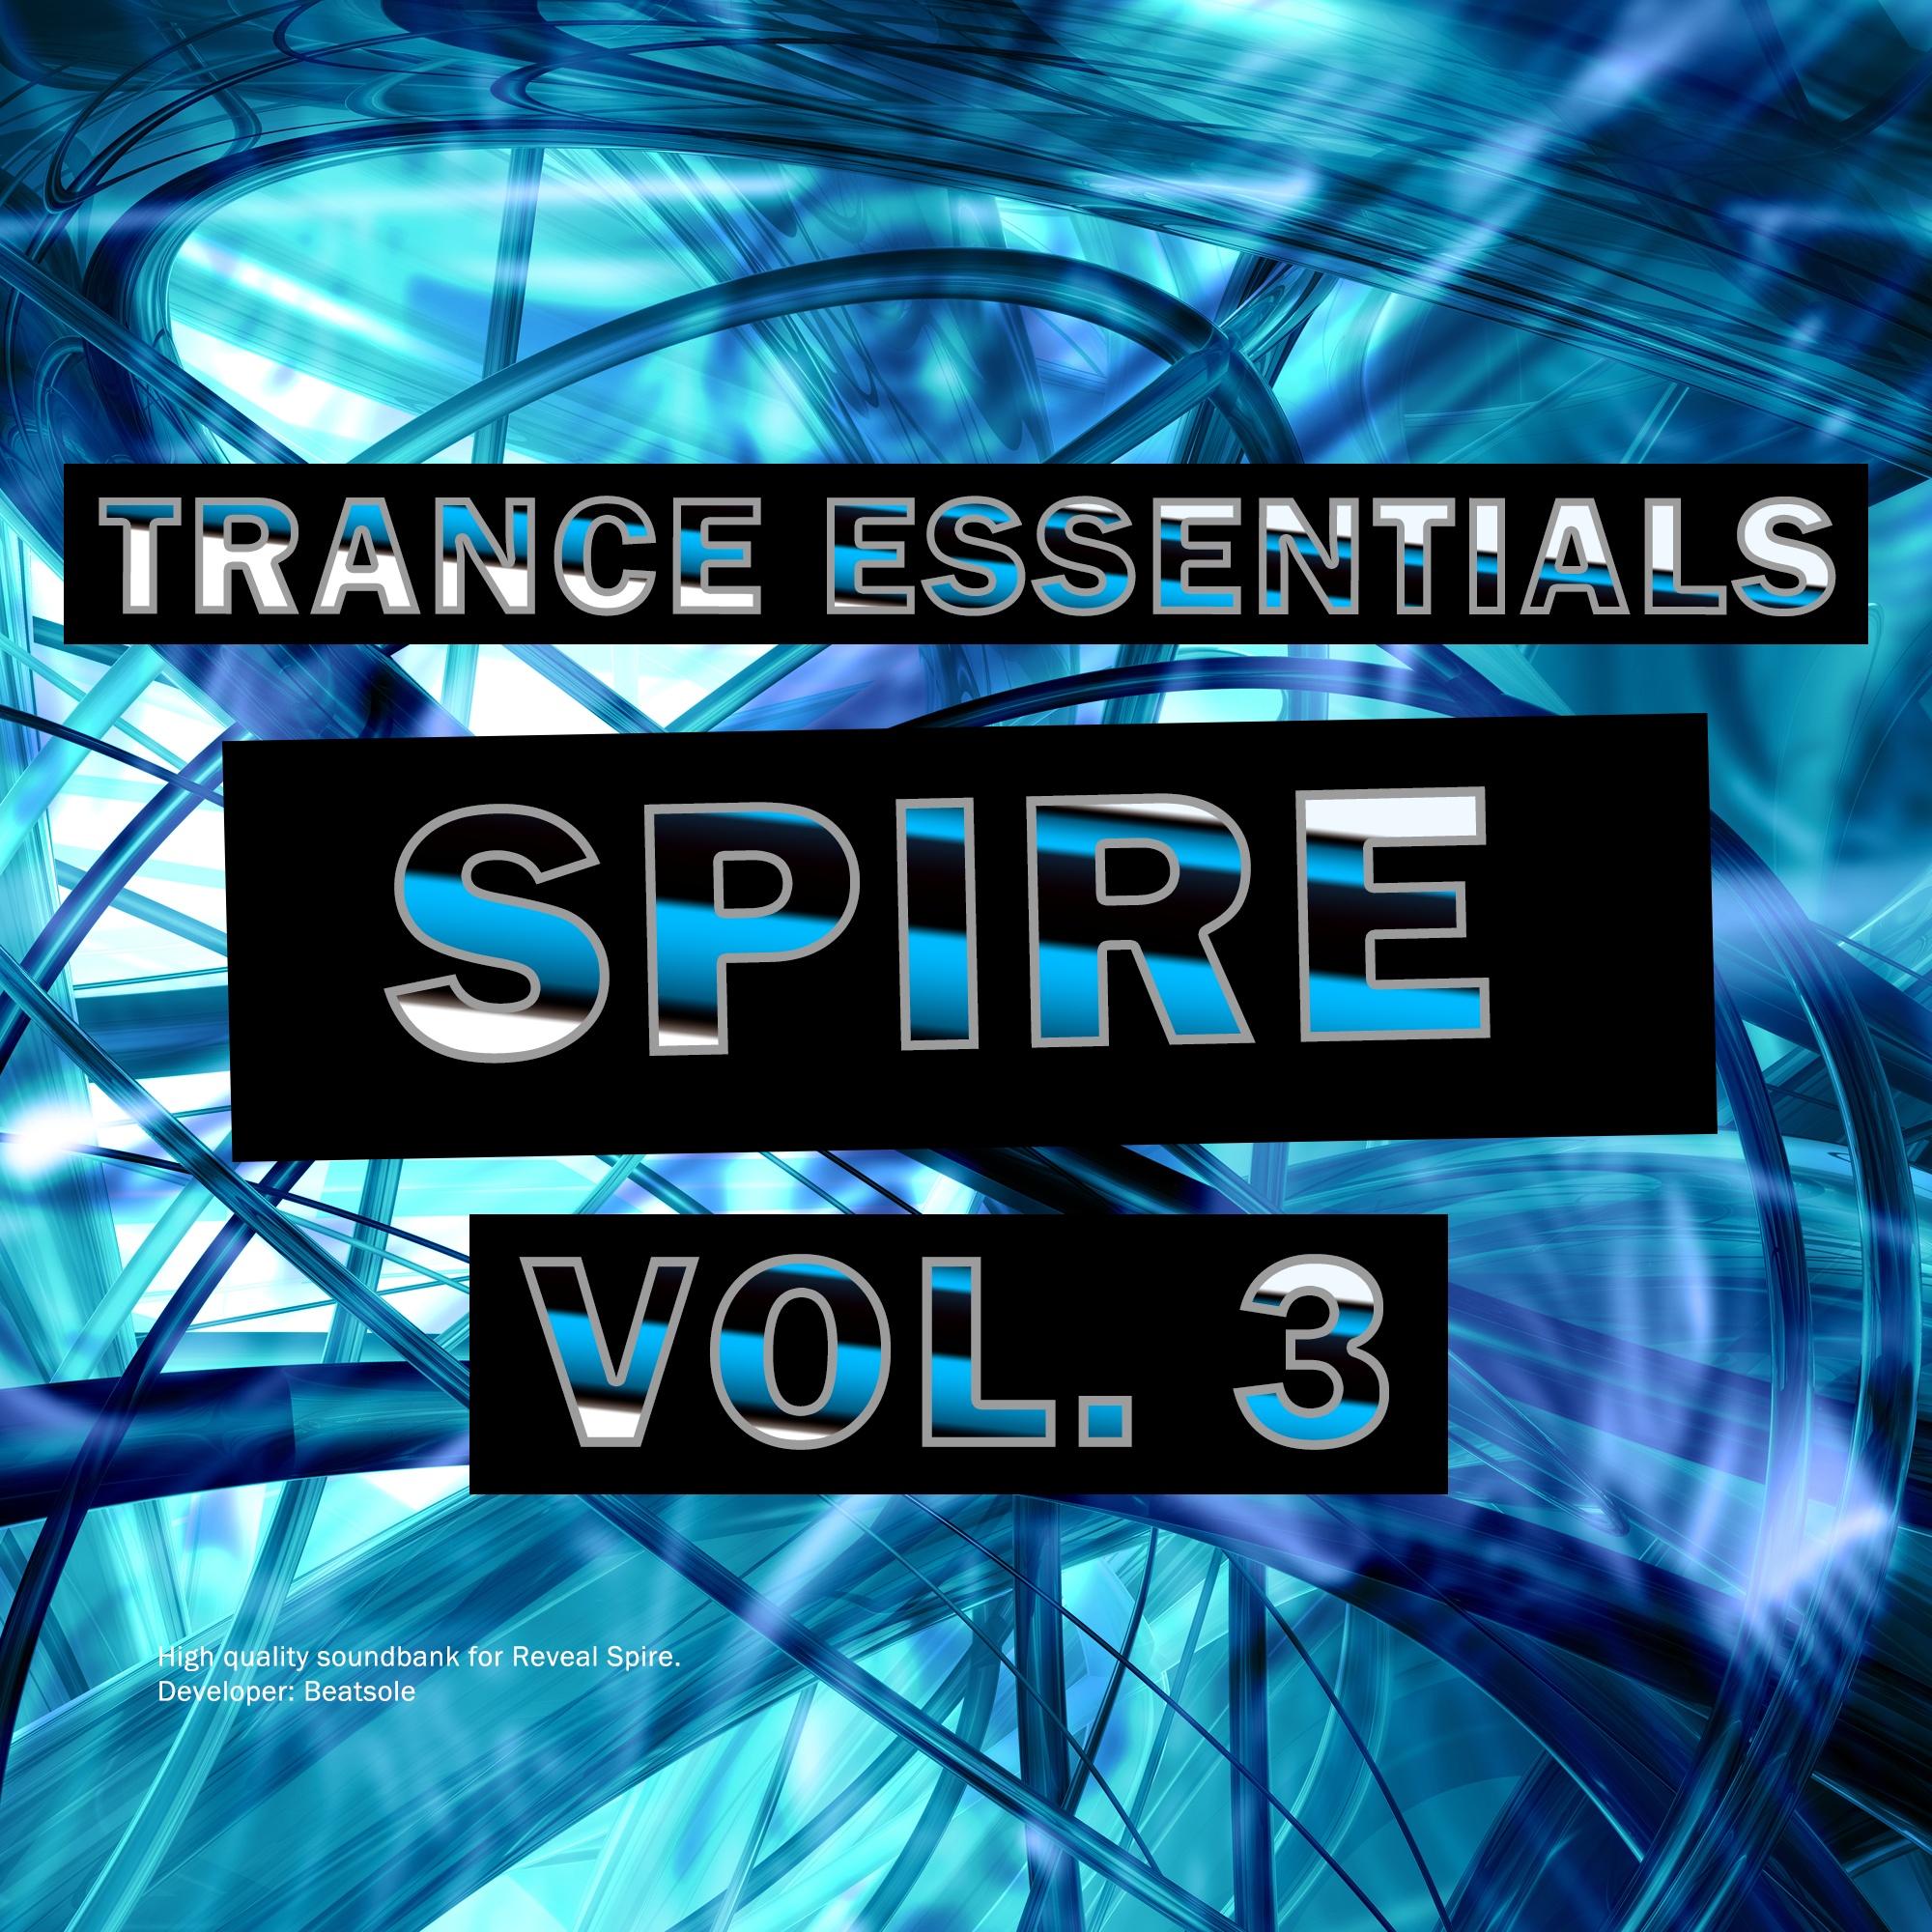 Trance Essentials Spire Vol. 3